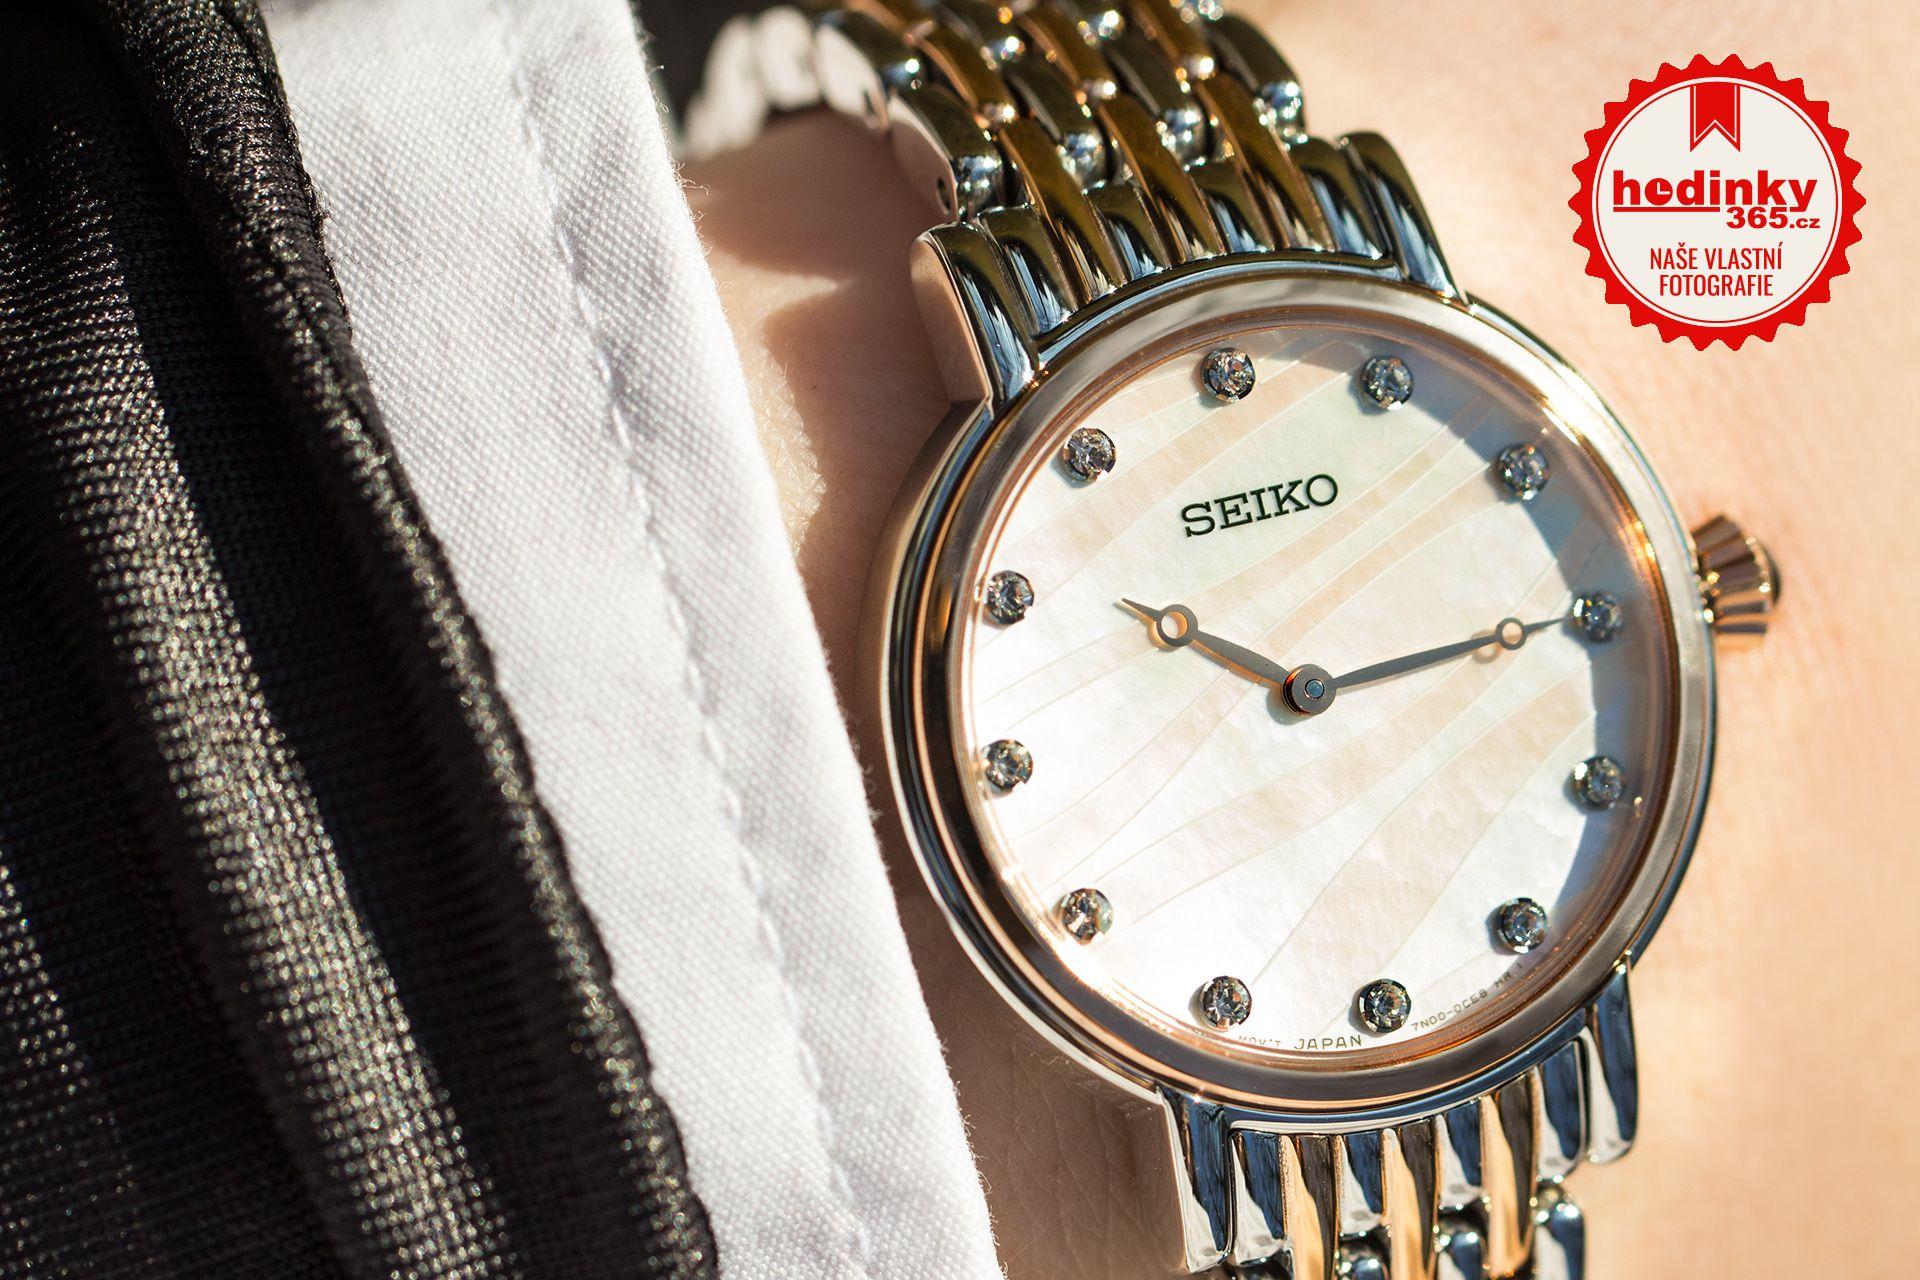 aae1e8c8bab Seiko Quartz SFQ806P1. Dámské hodinky - ocelový řemínek